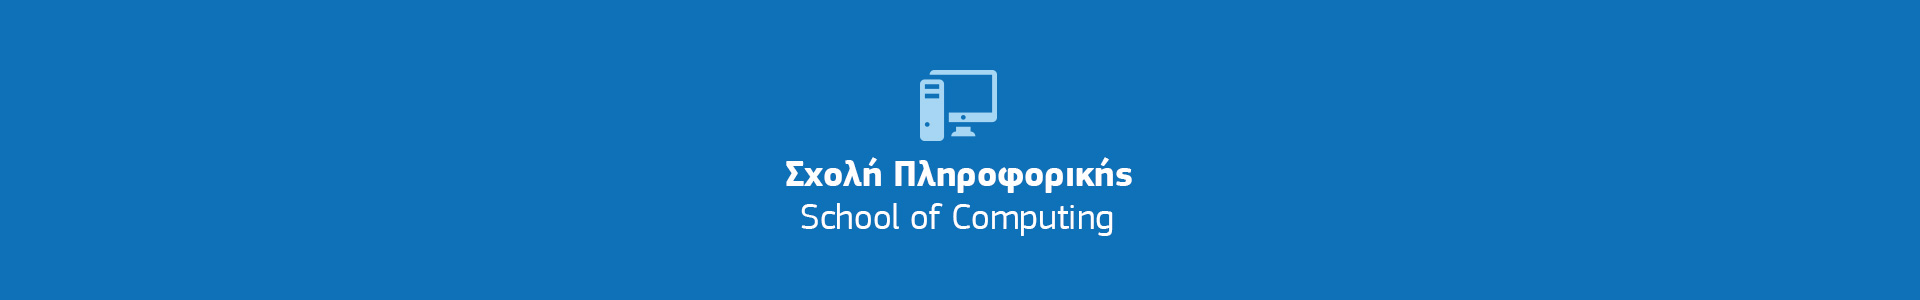 1920x300_computing